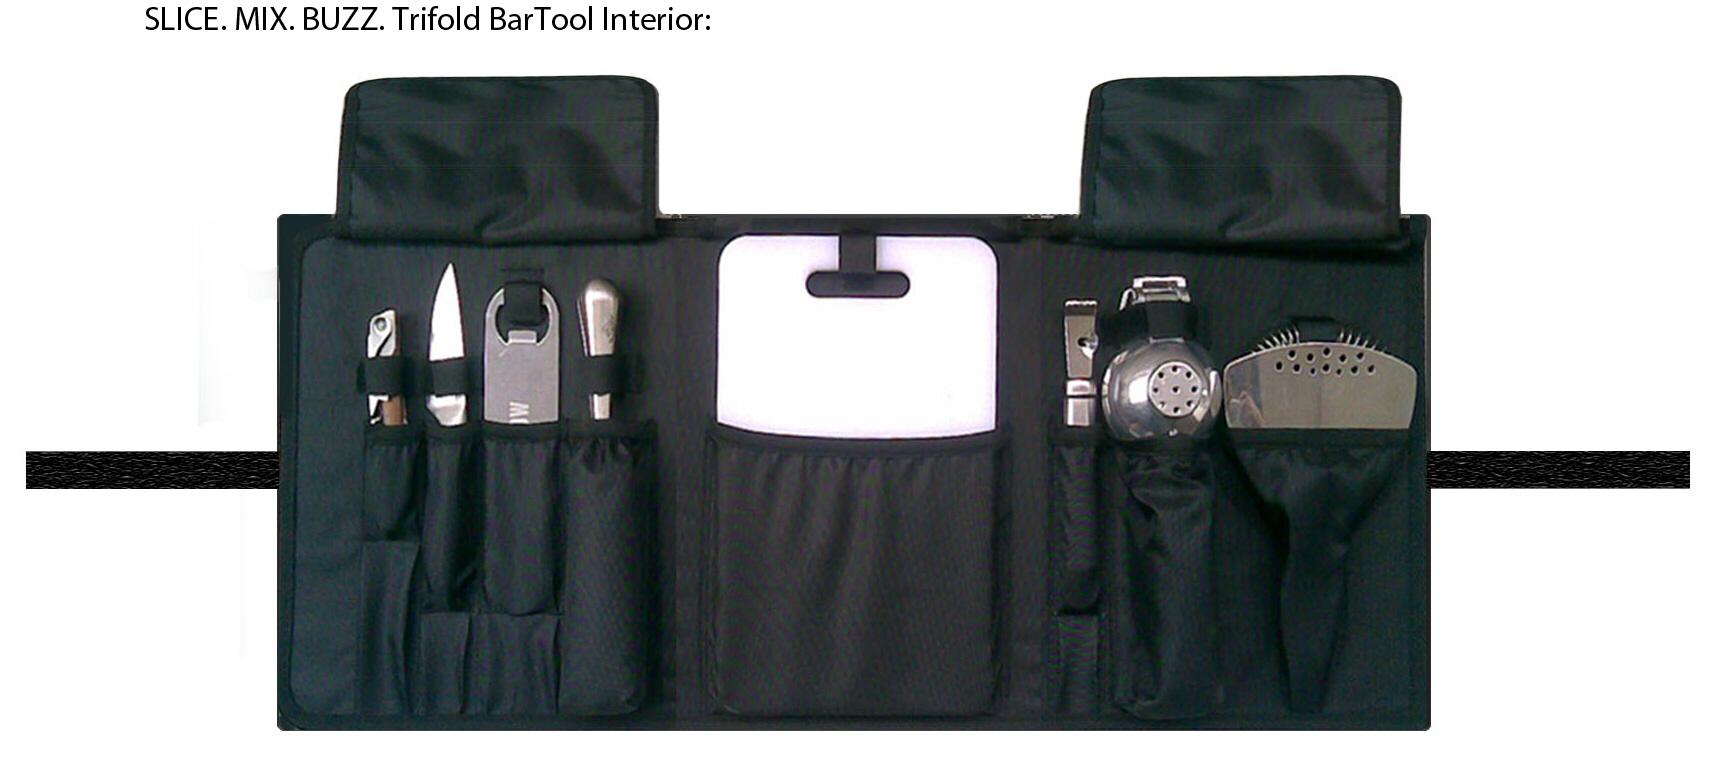 21. Trifold 2 BarTool Interior.jpg